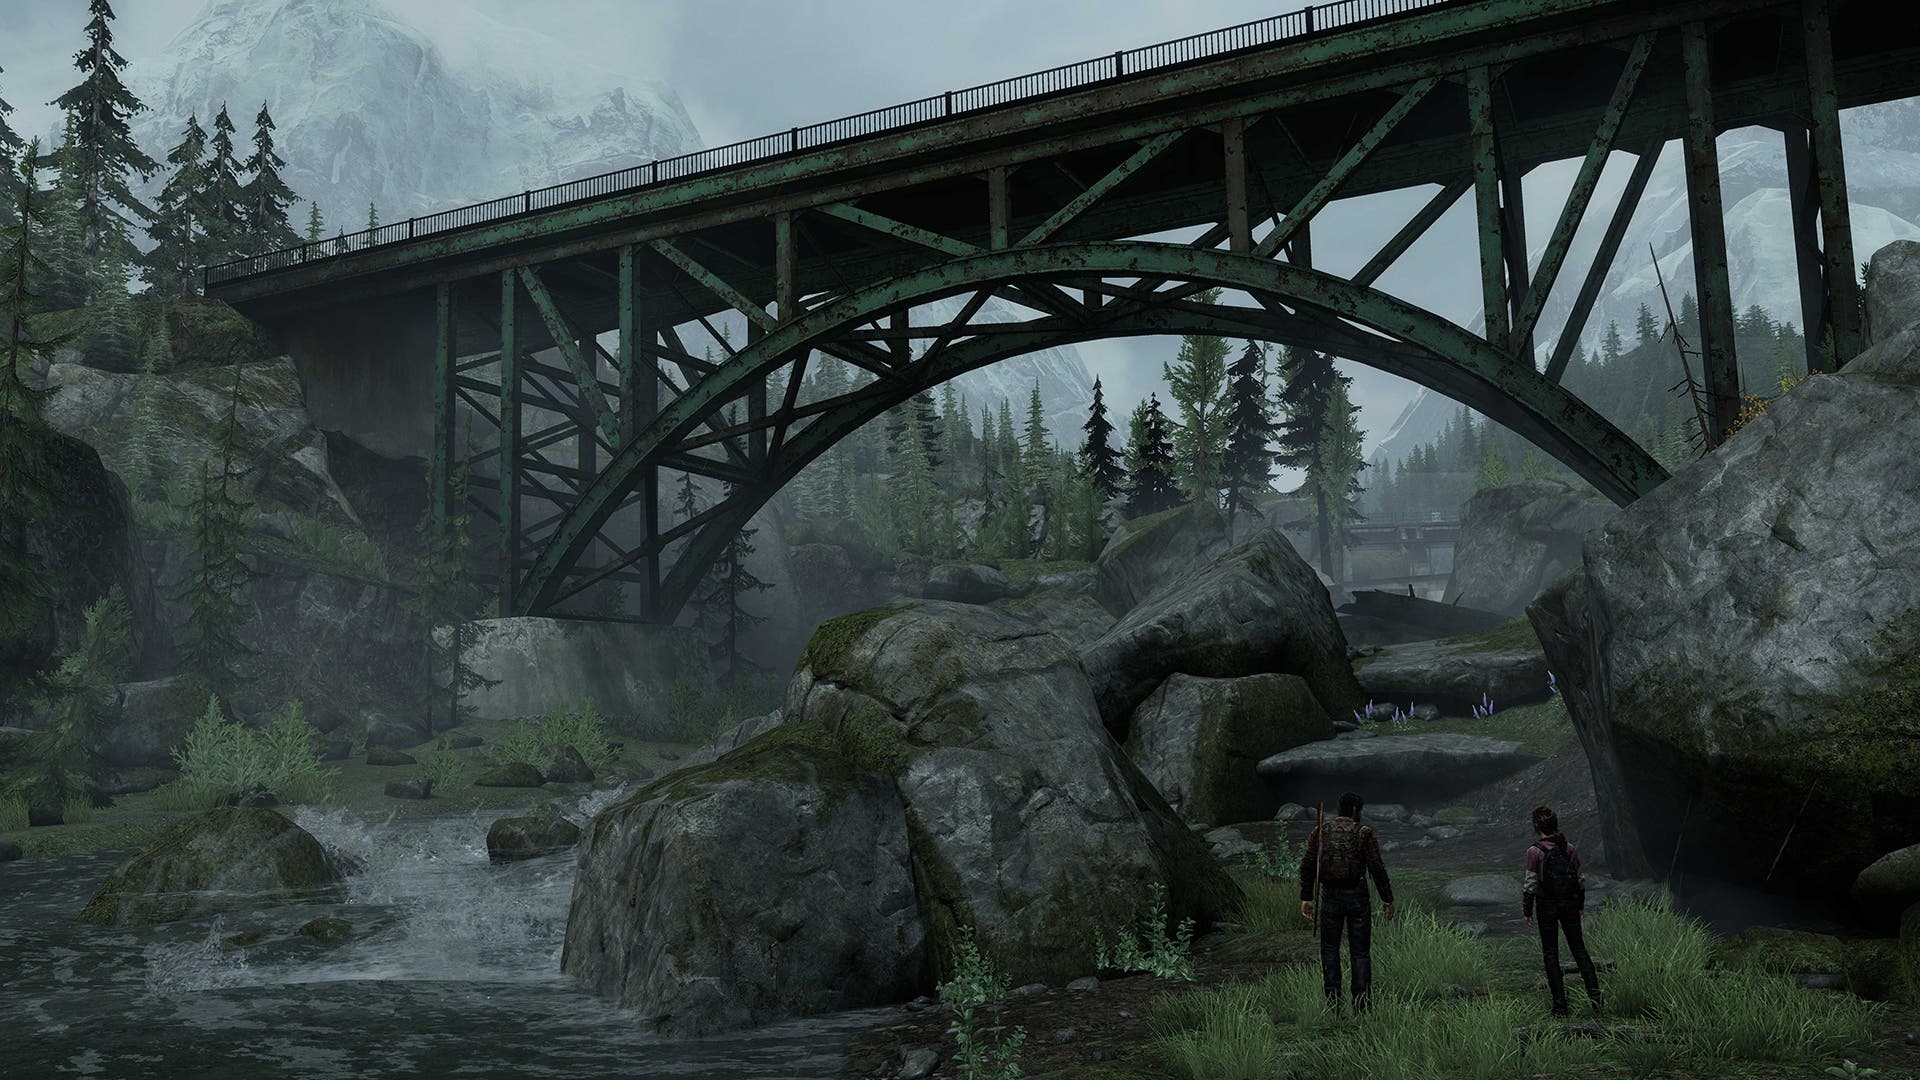 bridge view 1406594446